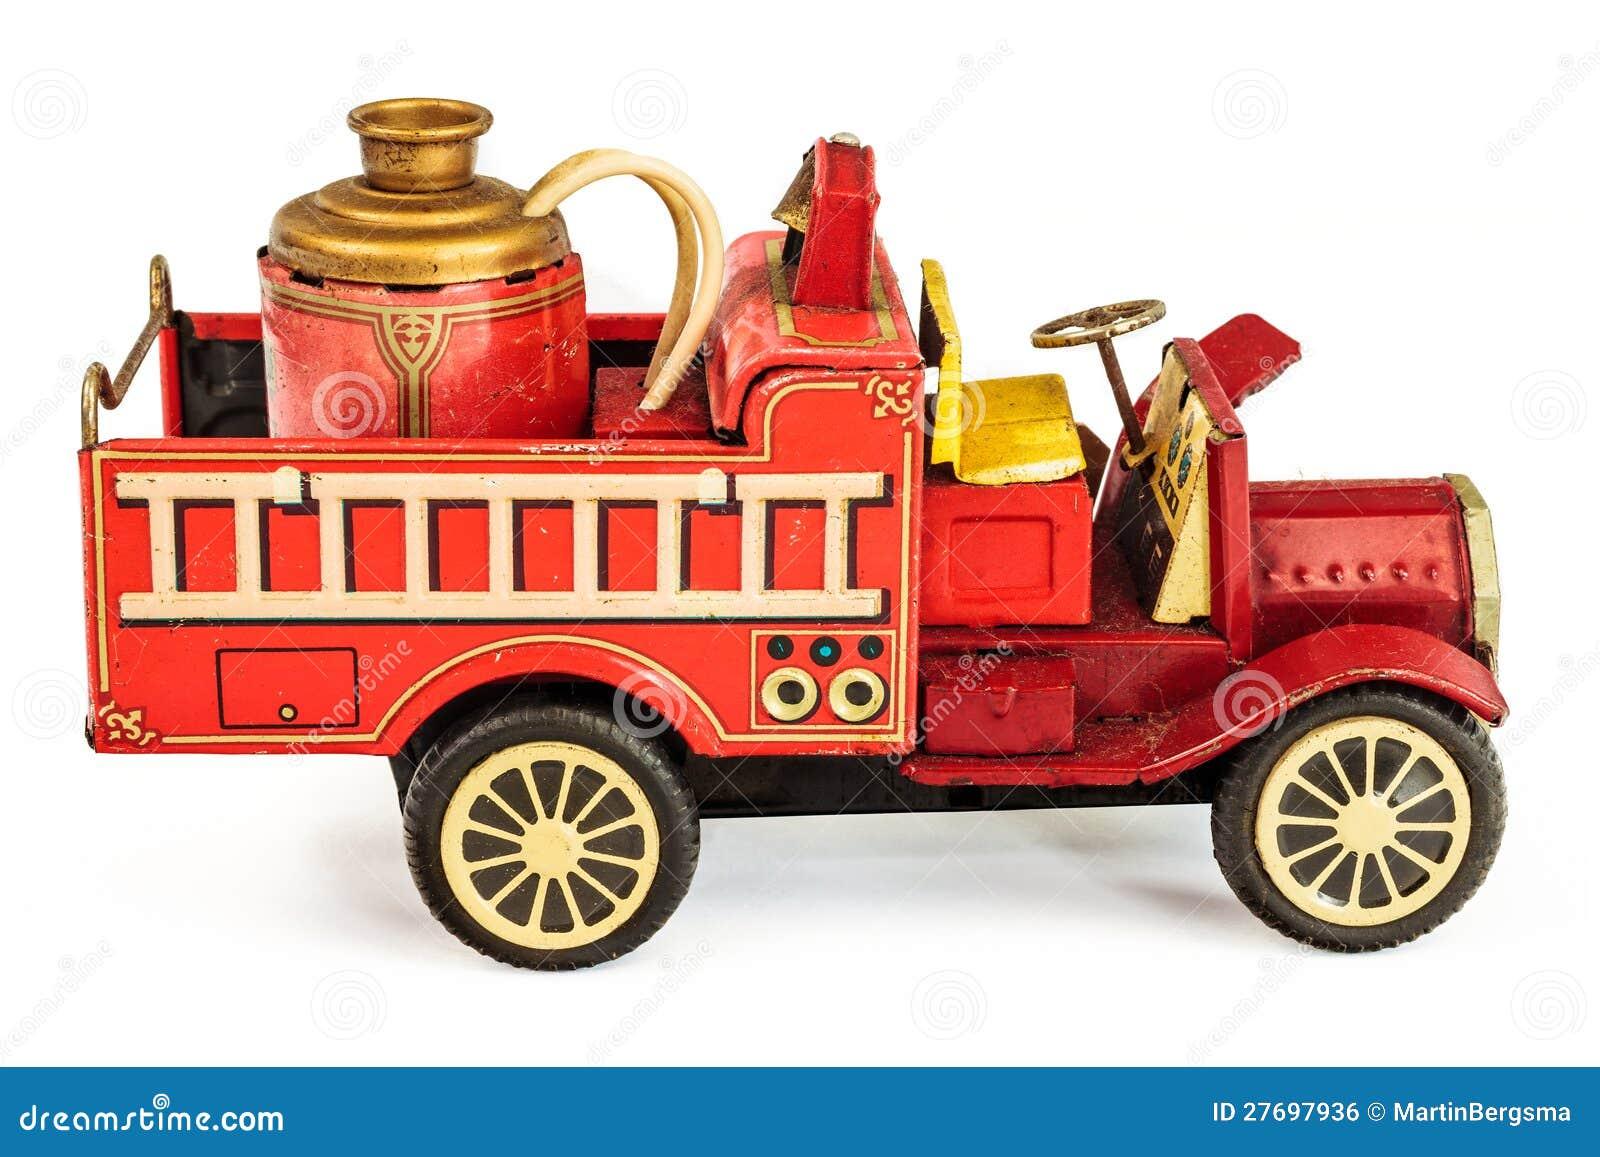 Vintage toy fire trucks